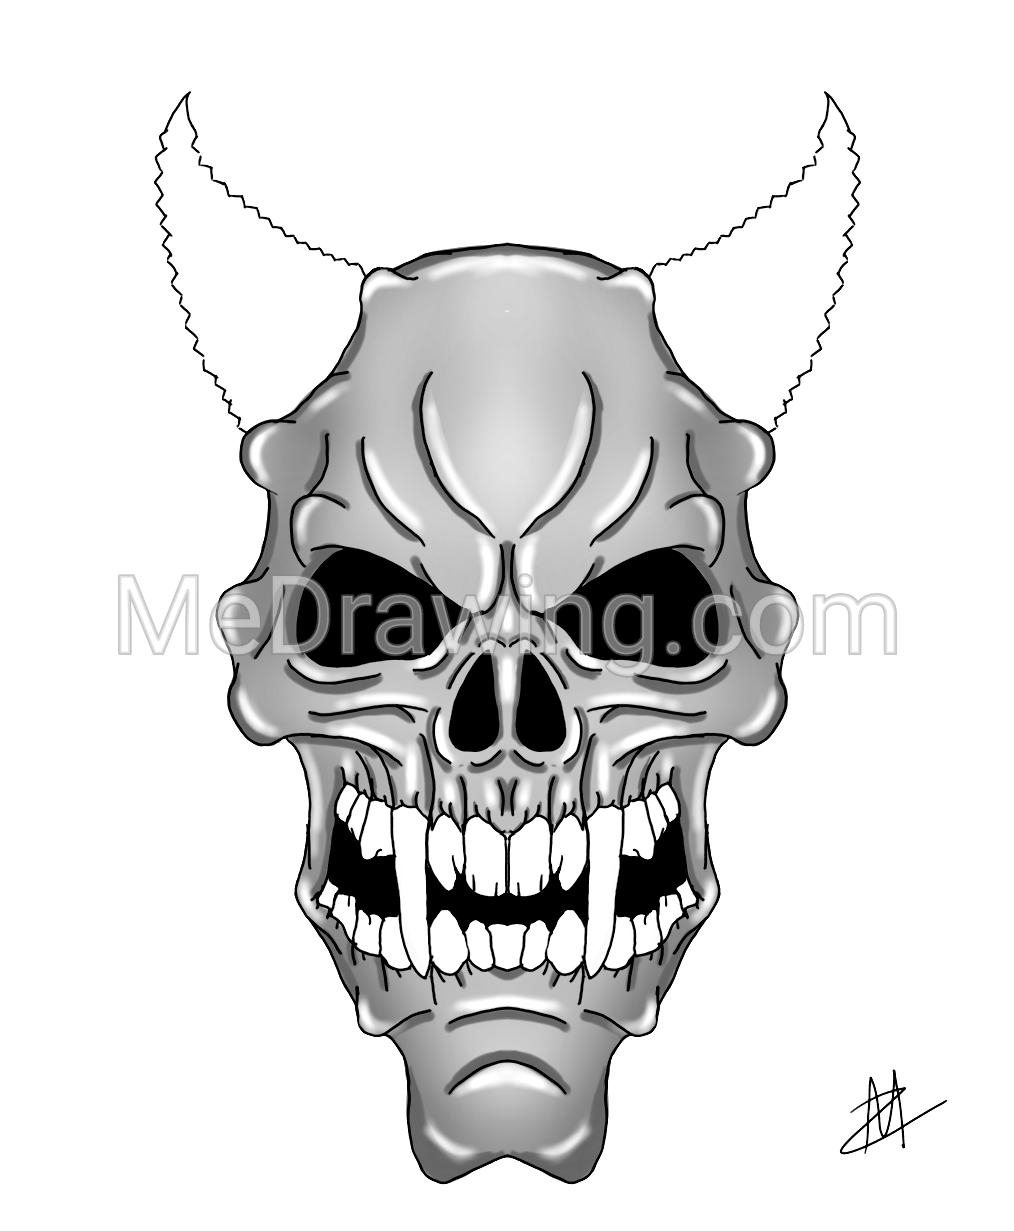 Purple Zombie Demon Skull Black And White Drawing Black And White Drawing Colorful Drawings Skull